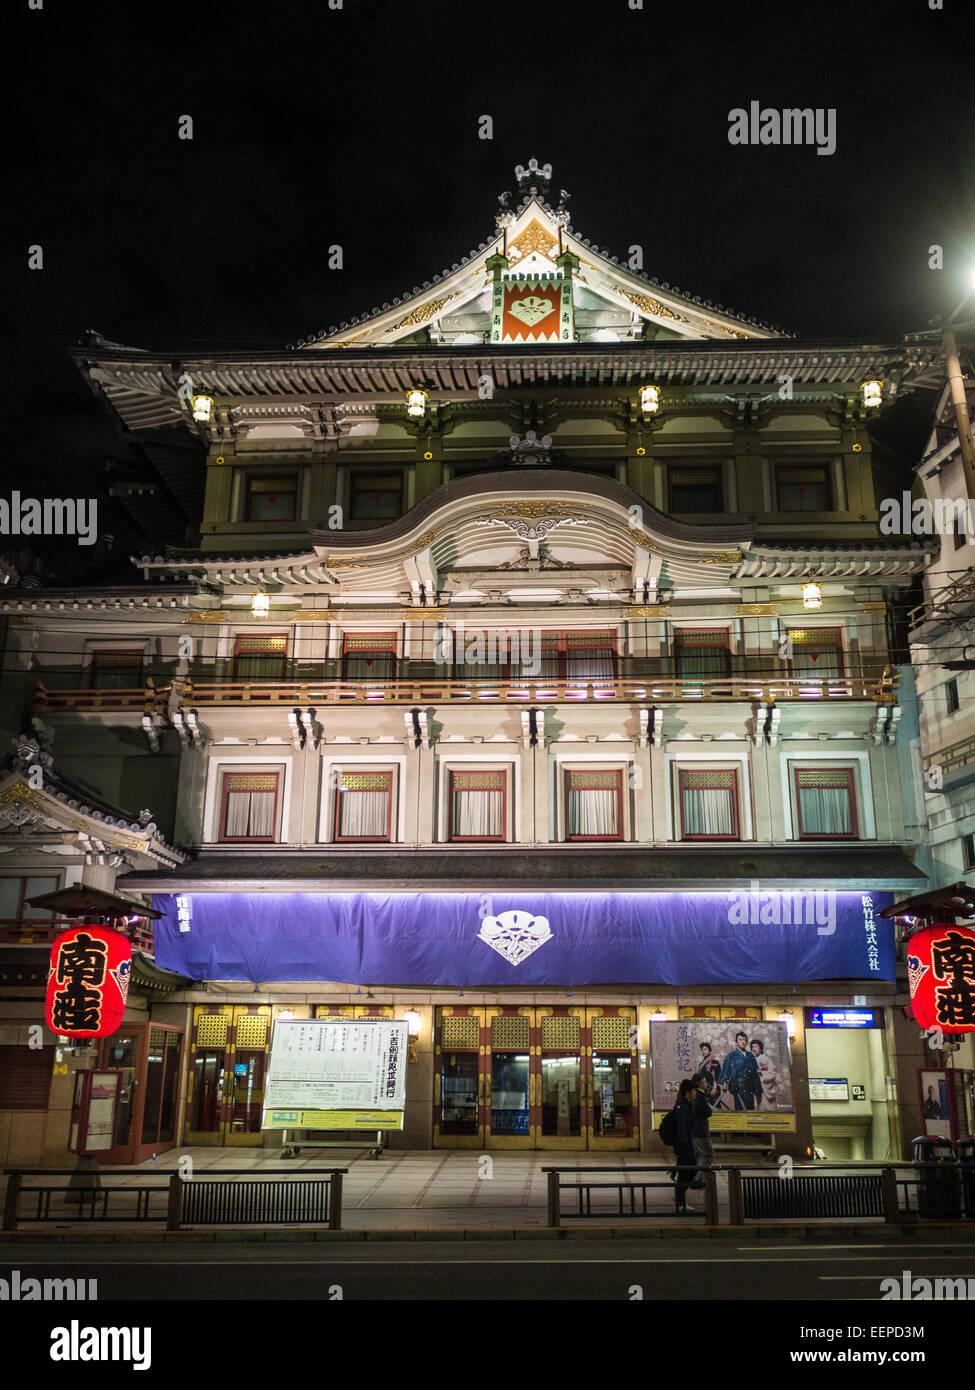 Minami-za theater facade illuminated in the night - Stock Image